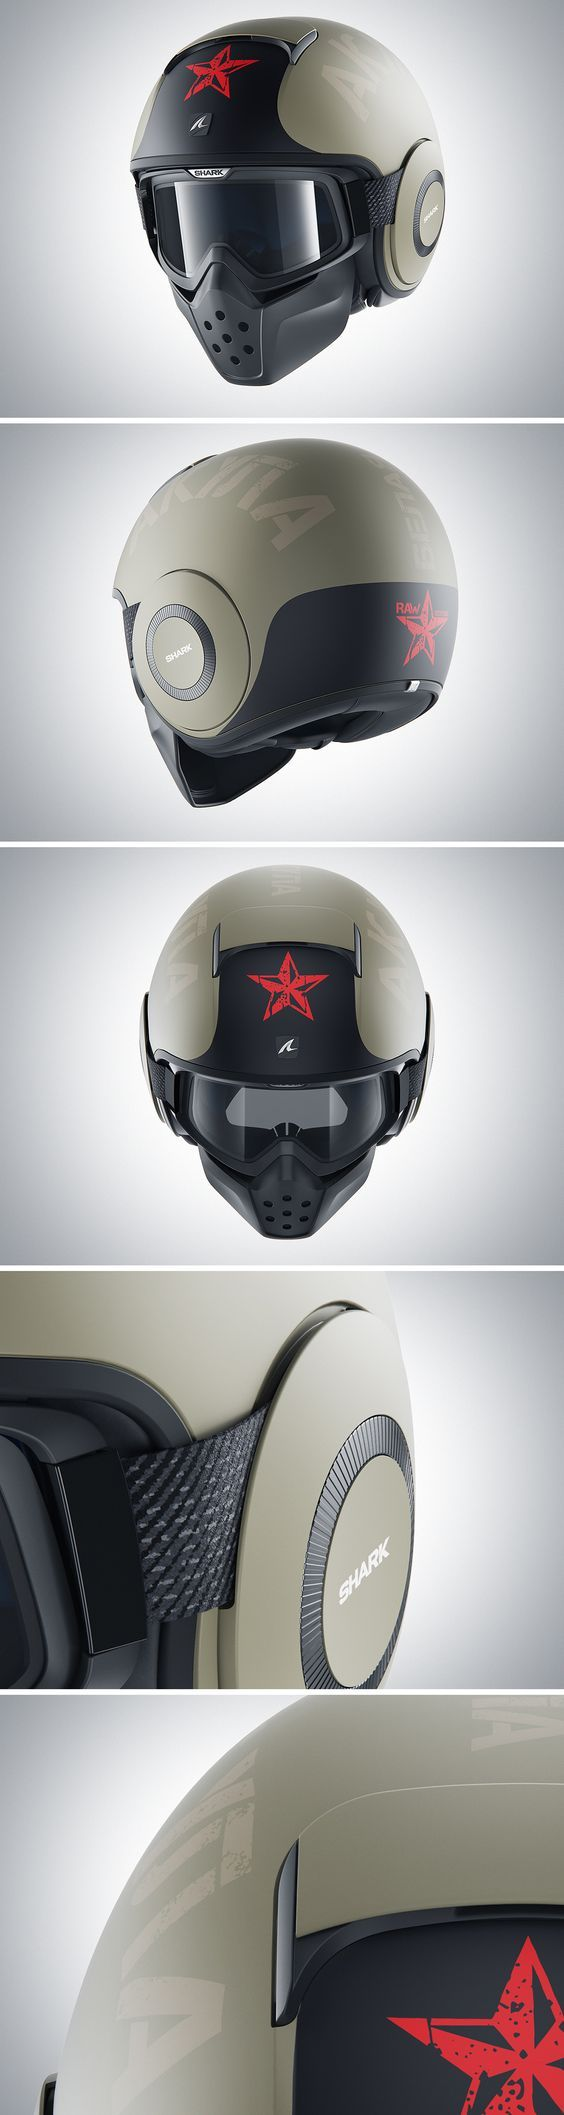 Shark Raw Soyouz Helmet                                                                                                                                                                                 More